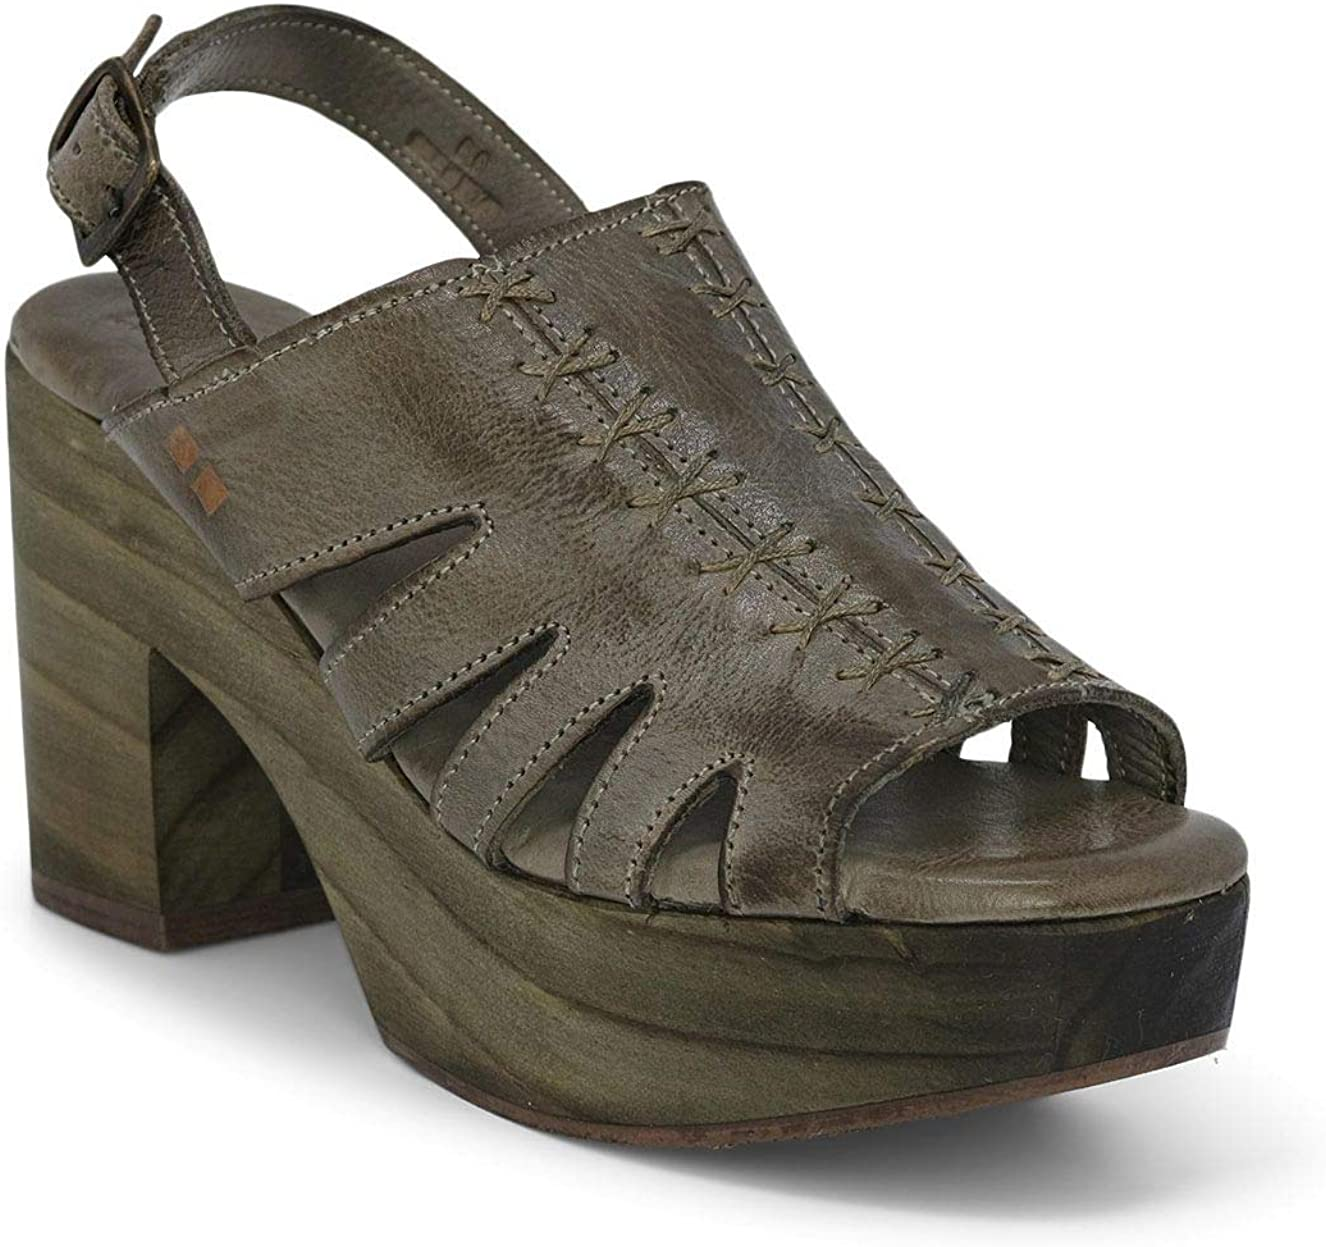 Bed Quality inspection Genuine Free Shipping Stu Fontella Women's Leather - Sandals Platform Heel